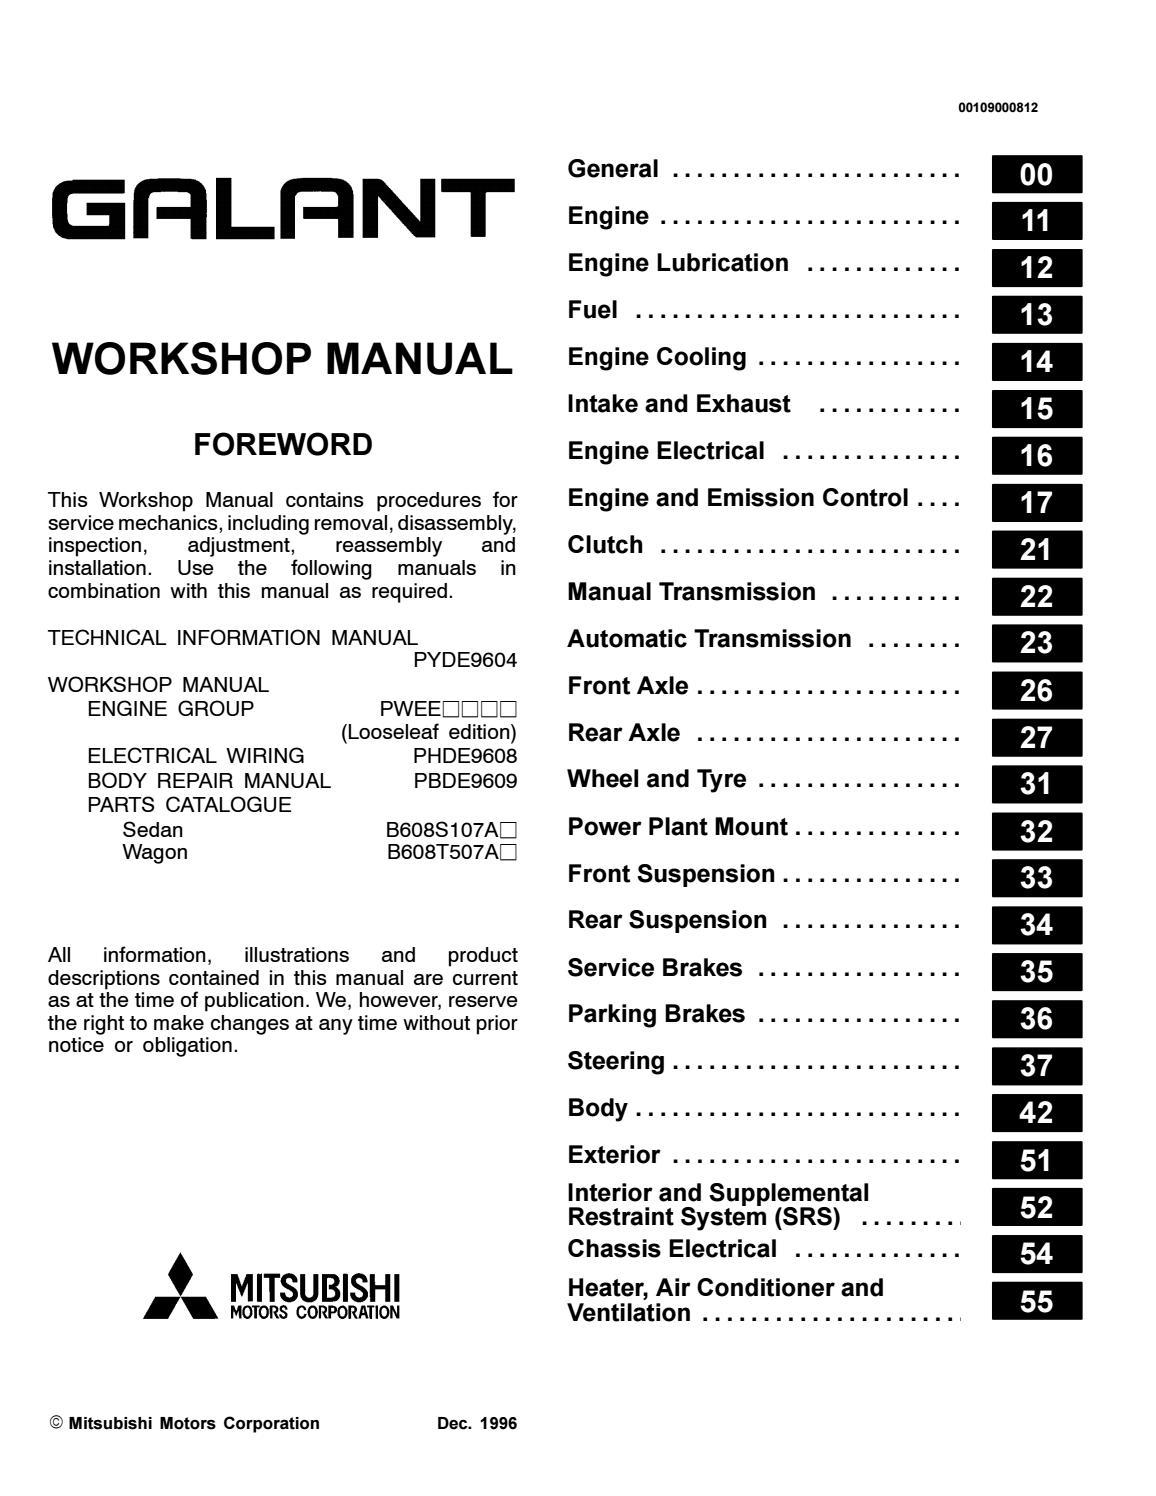 2001 Mitsubishi Galant Service Repair Manual By 16393610 Issuu